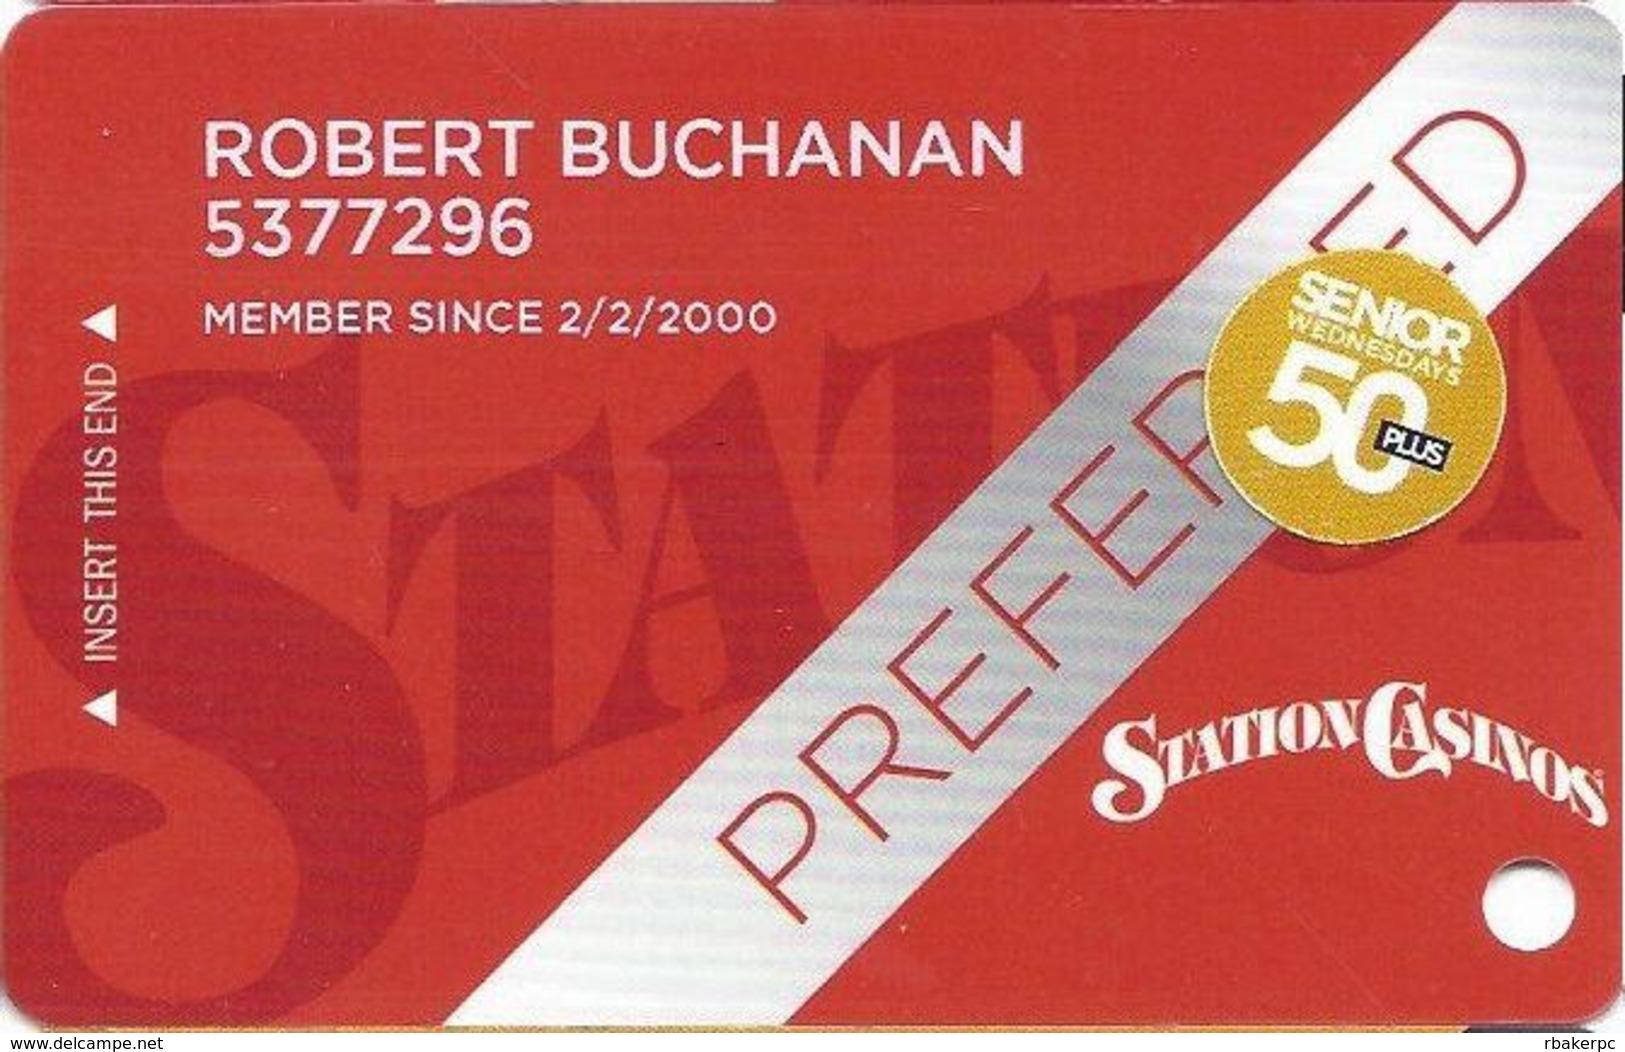 Station Casinos Las Vegas, NV - Slot Card Copyright 2012 - Preferred / 50+ Senior - Casino Cards